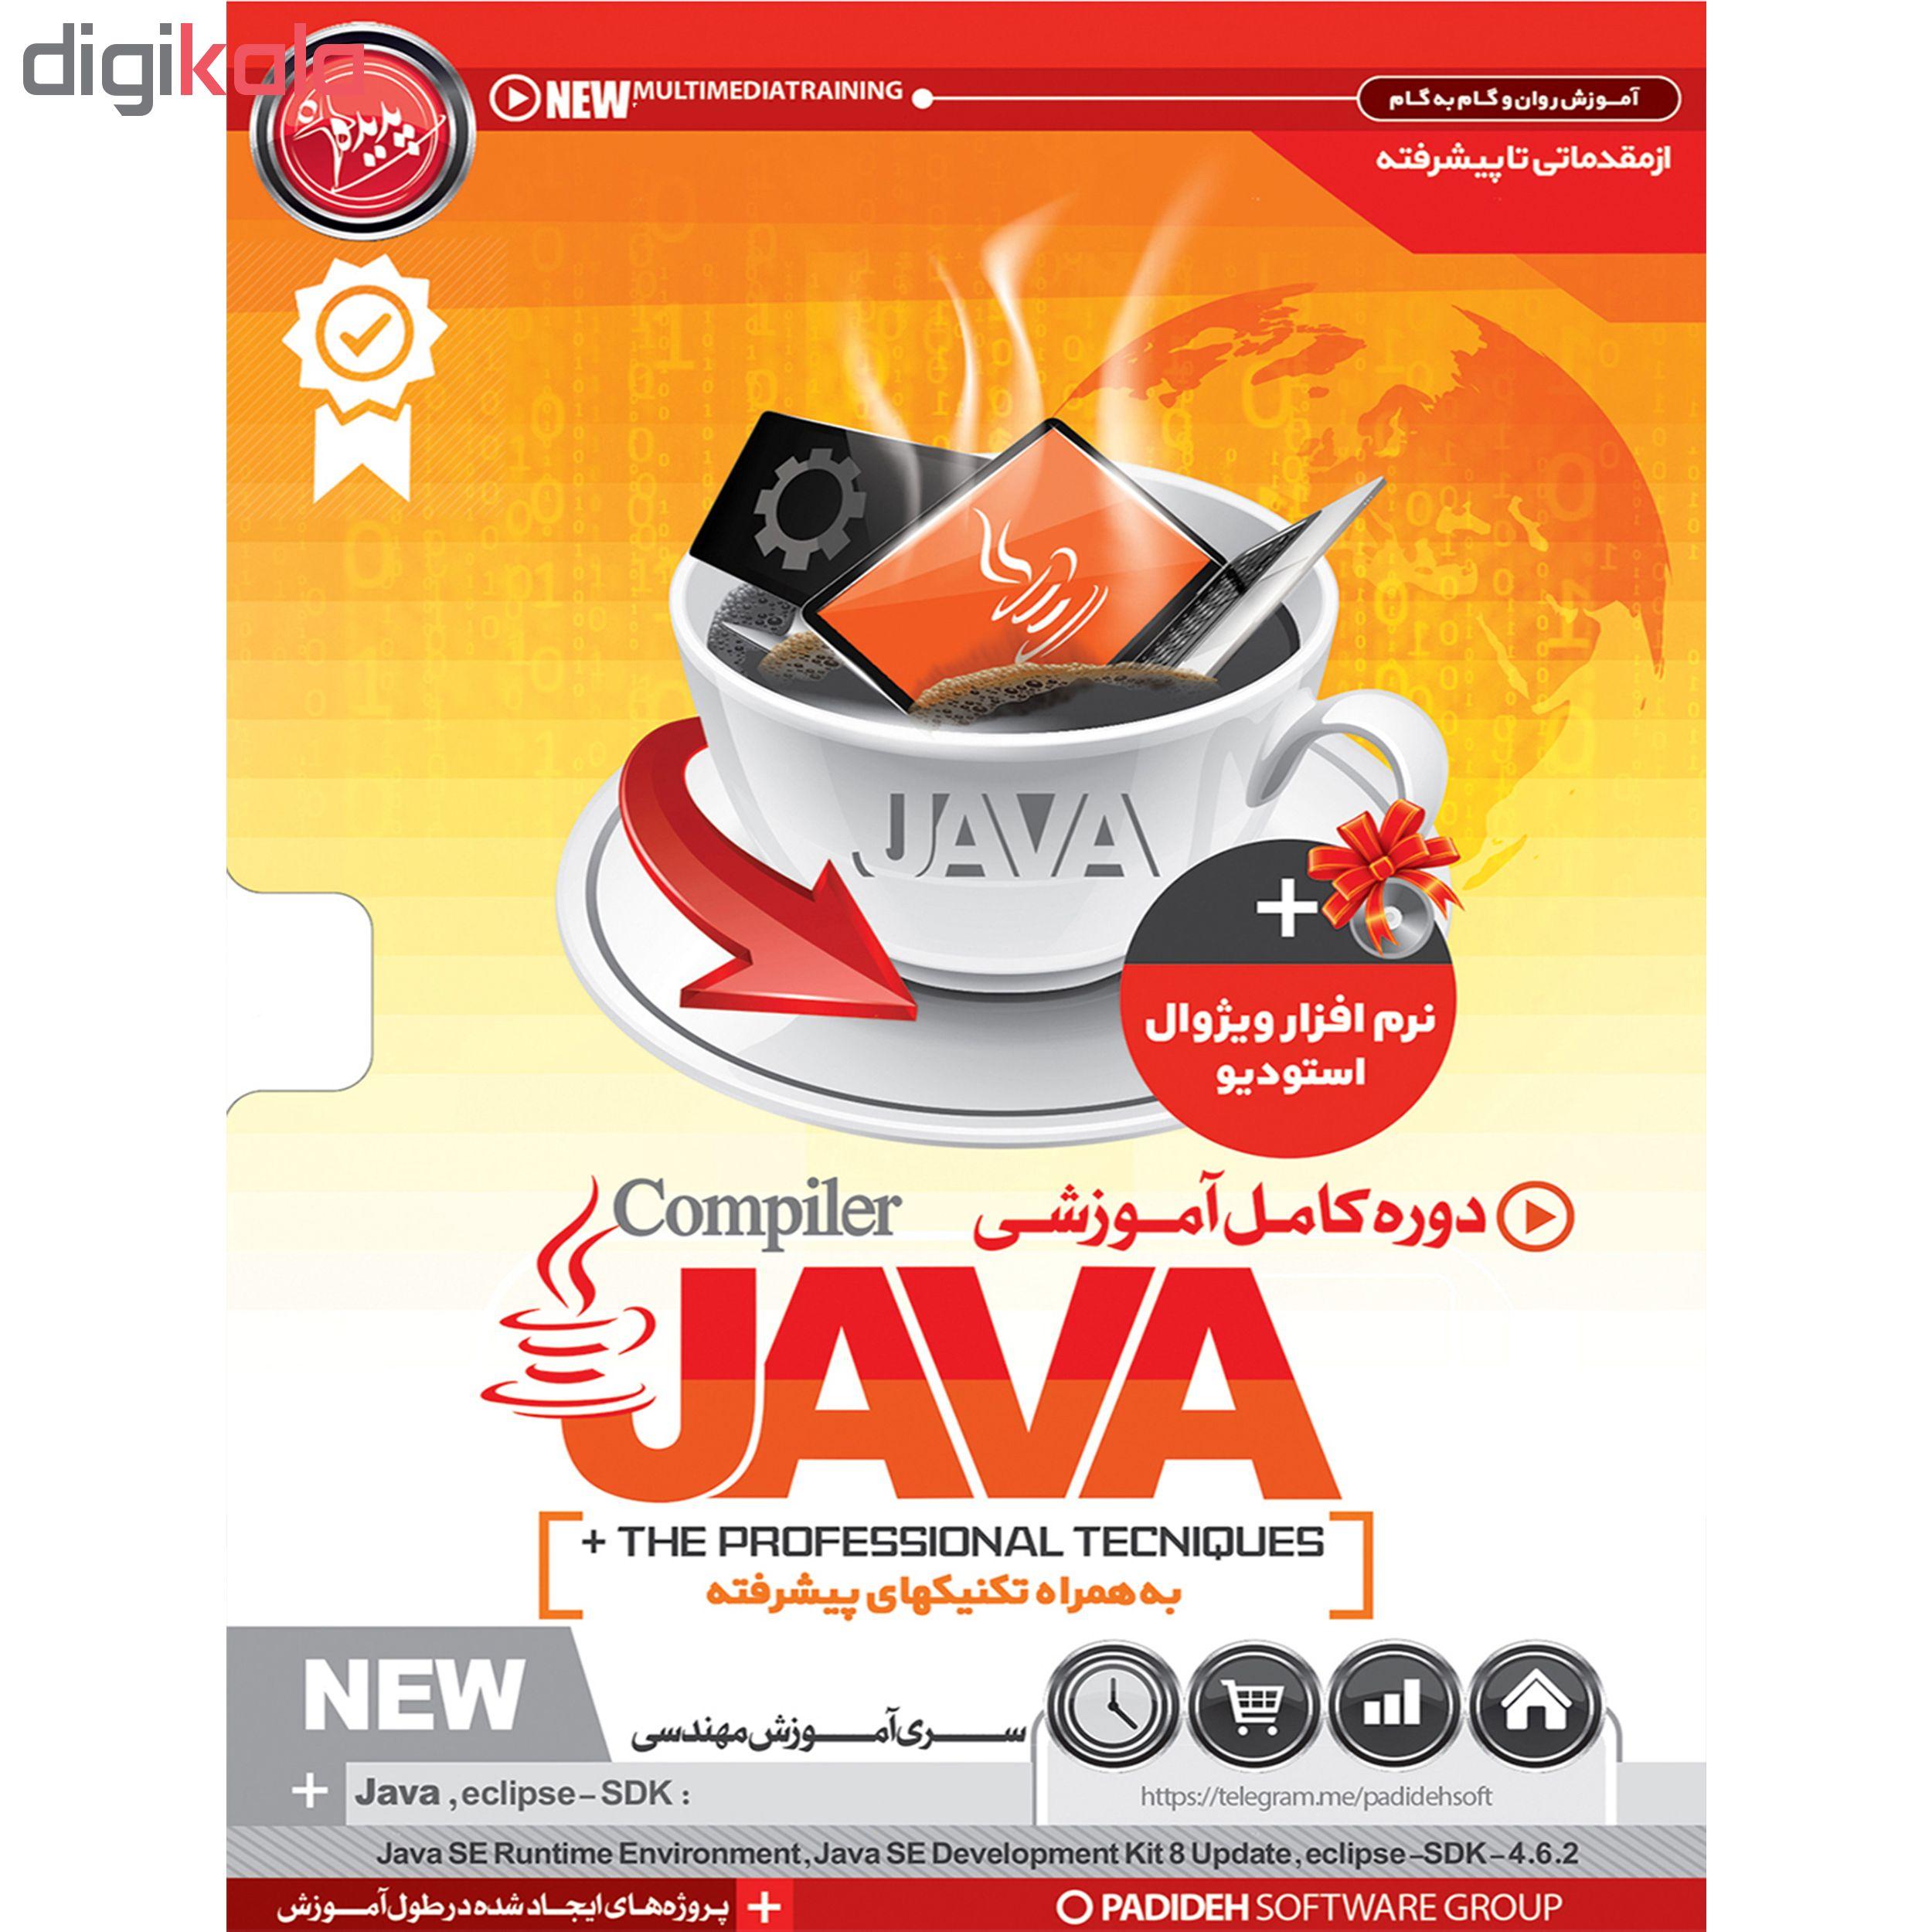 نرم افزار آموزش JAVA نشر پدیده به همراه نرم افزار آموزش HTML 5 نشر پدیا سافت